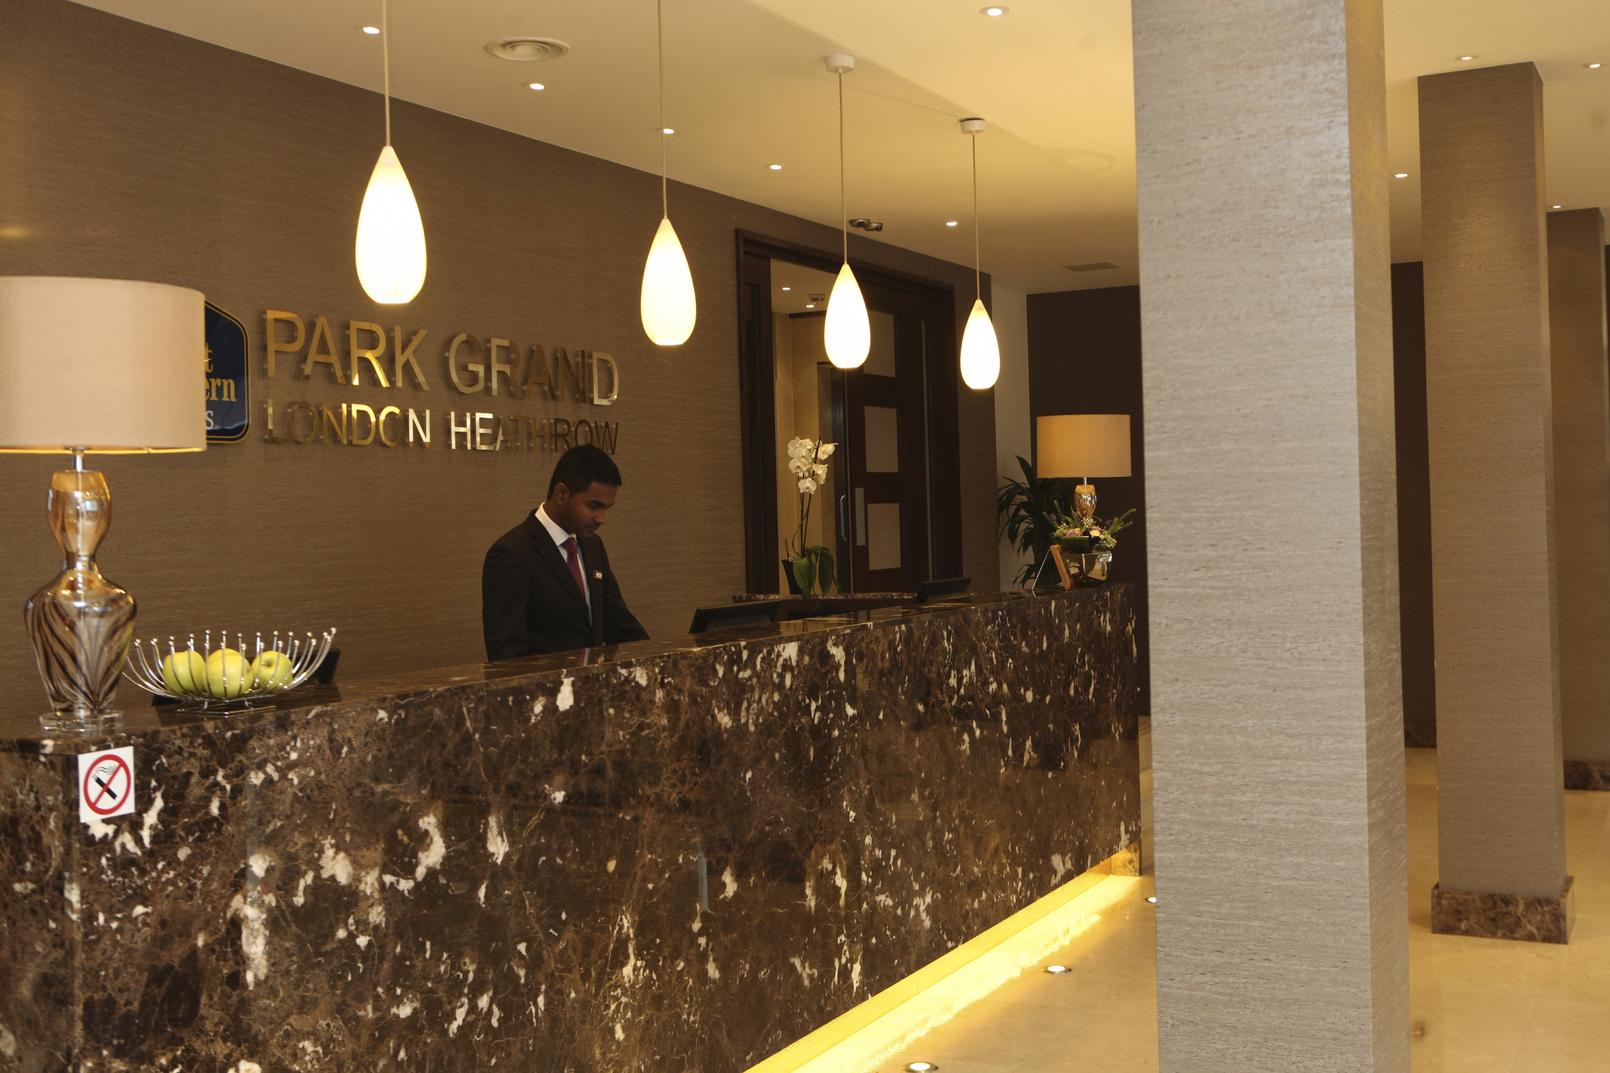 Best Western Park Grand Hotel London Heathrow